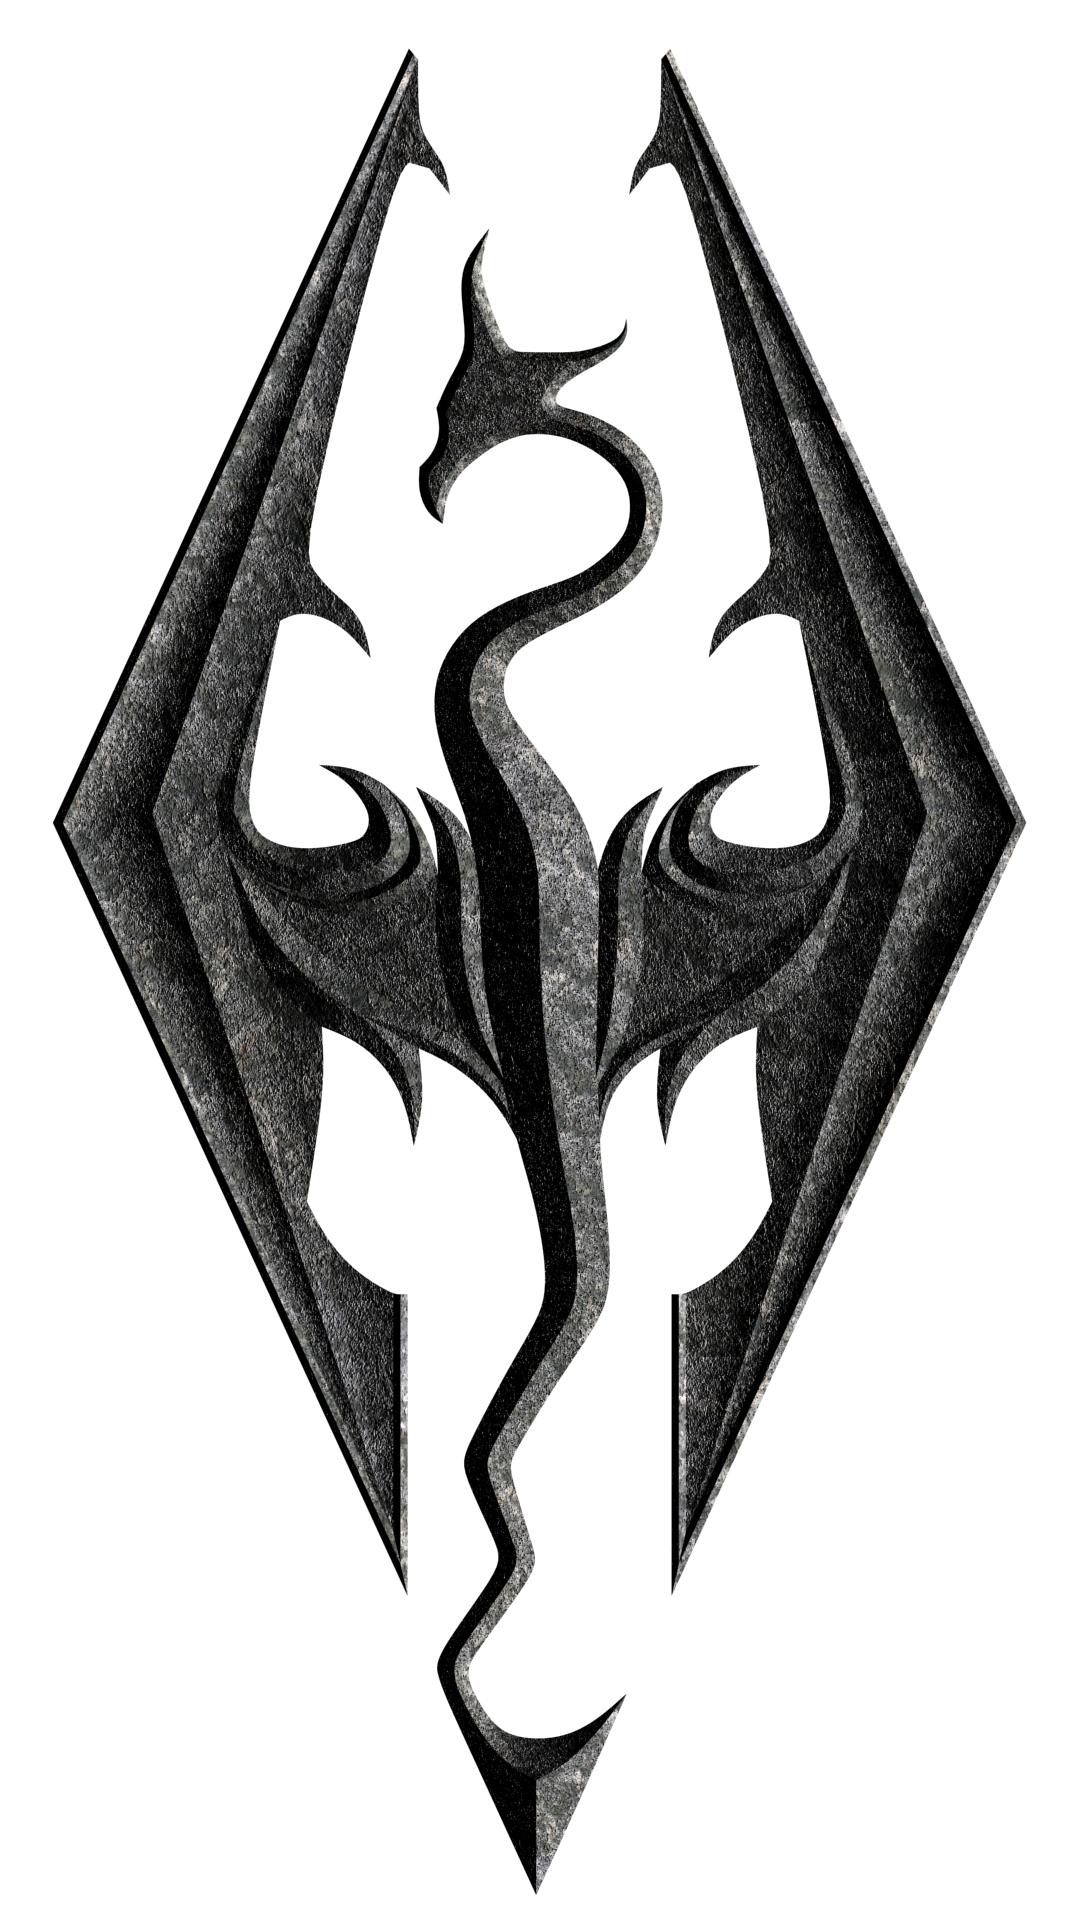 skyrim dragon symbol Google Search Skyrim Pinterest